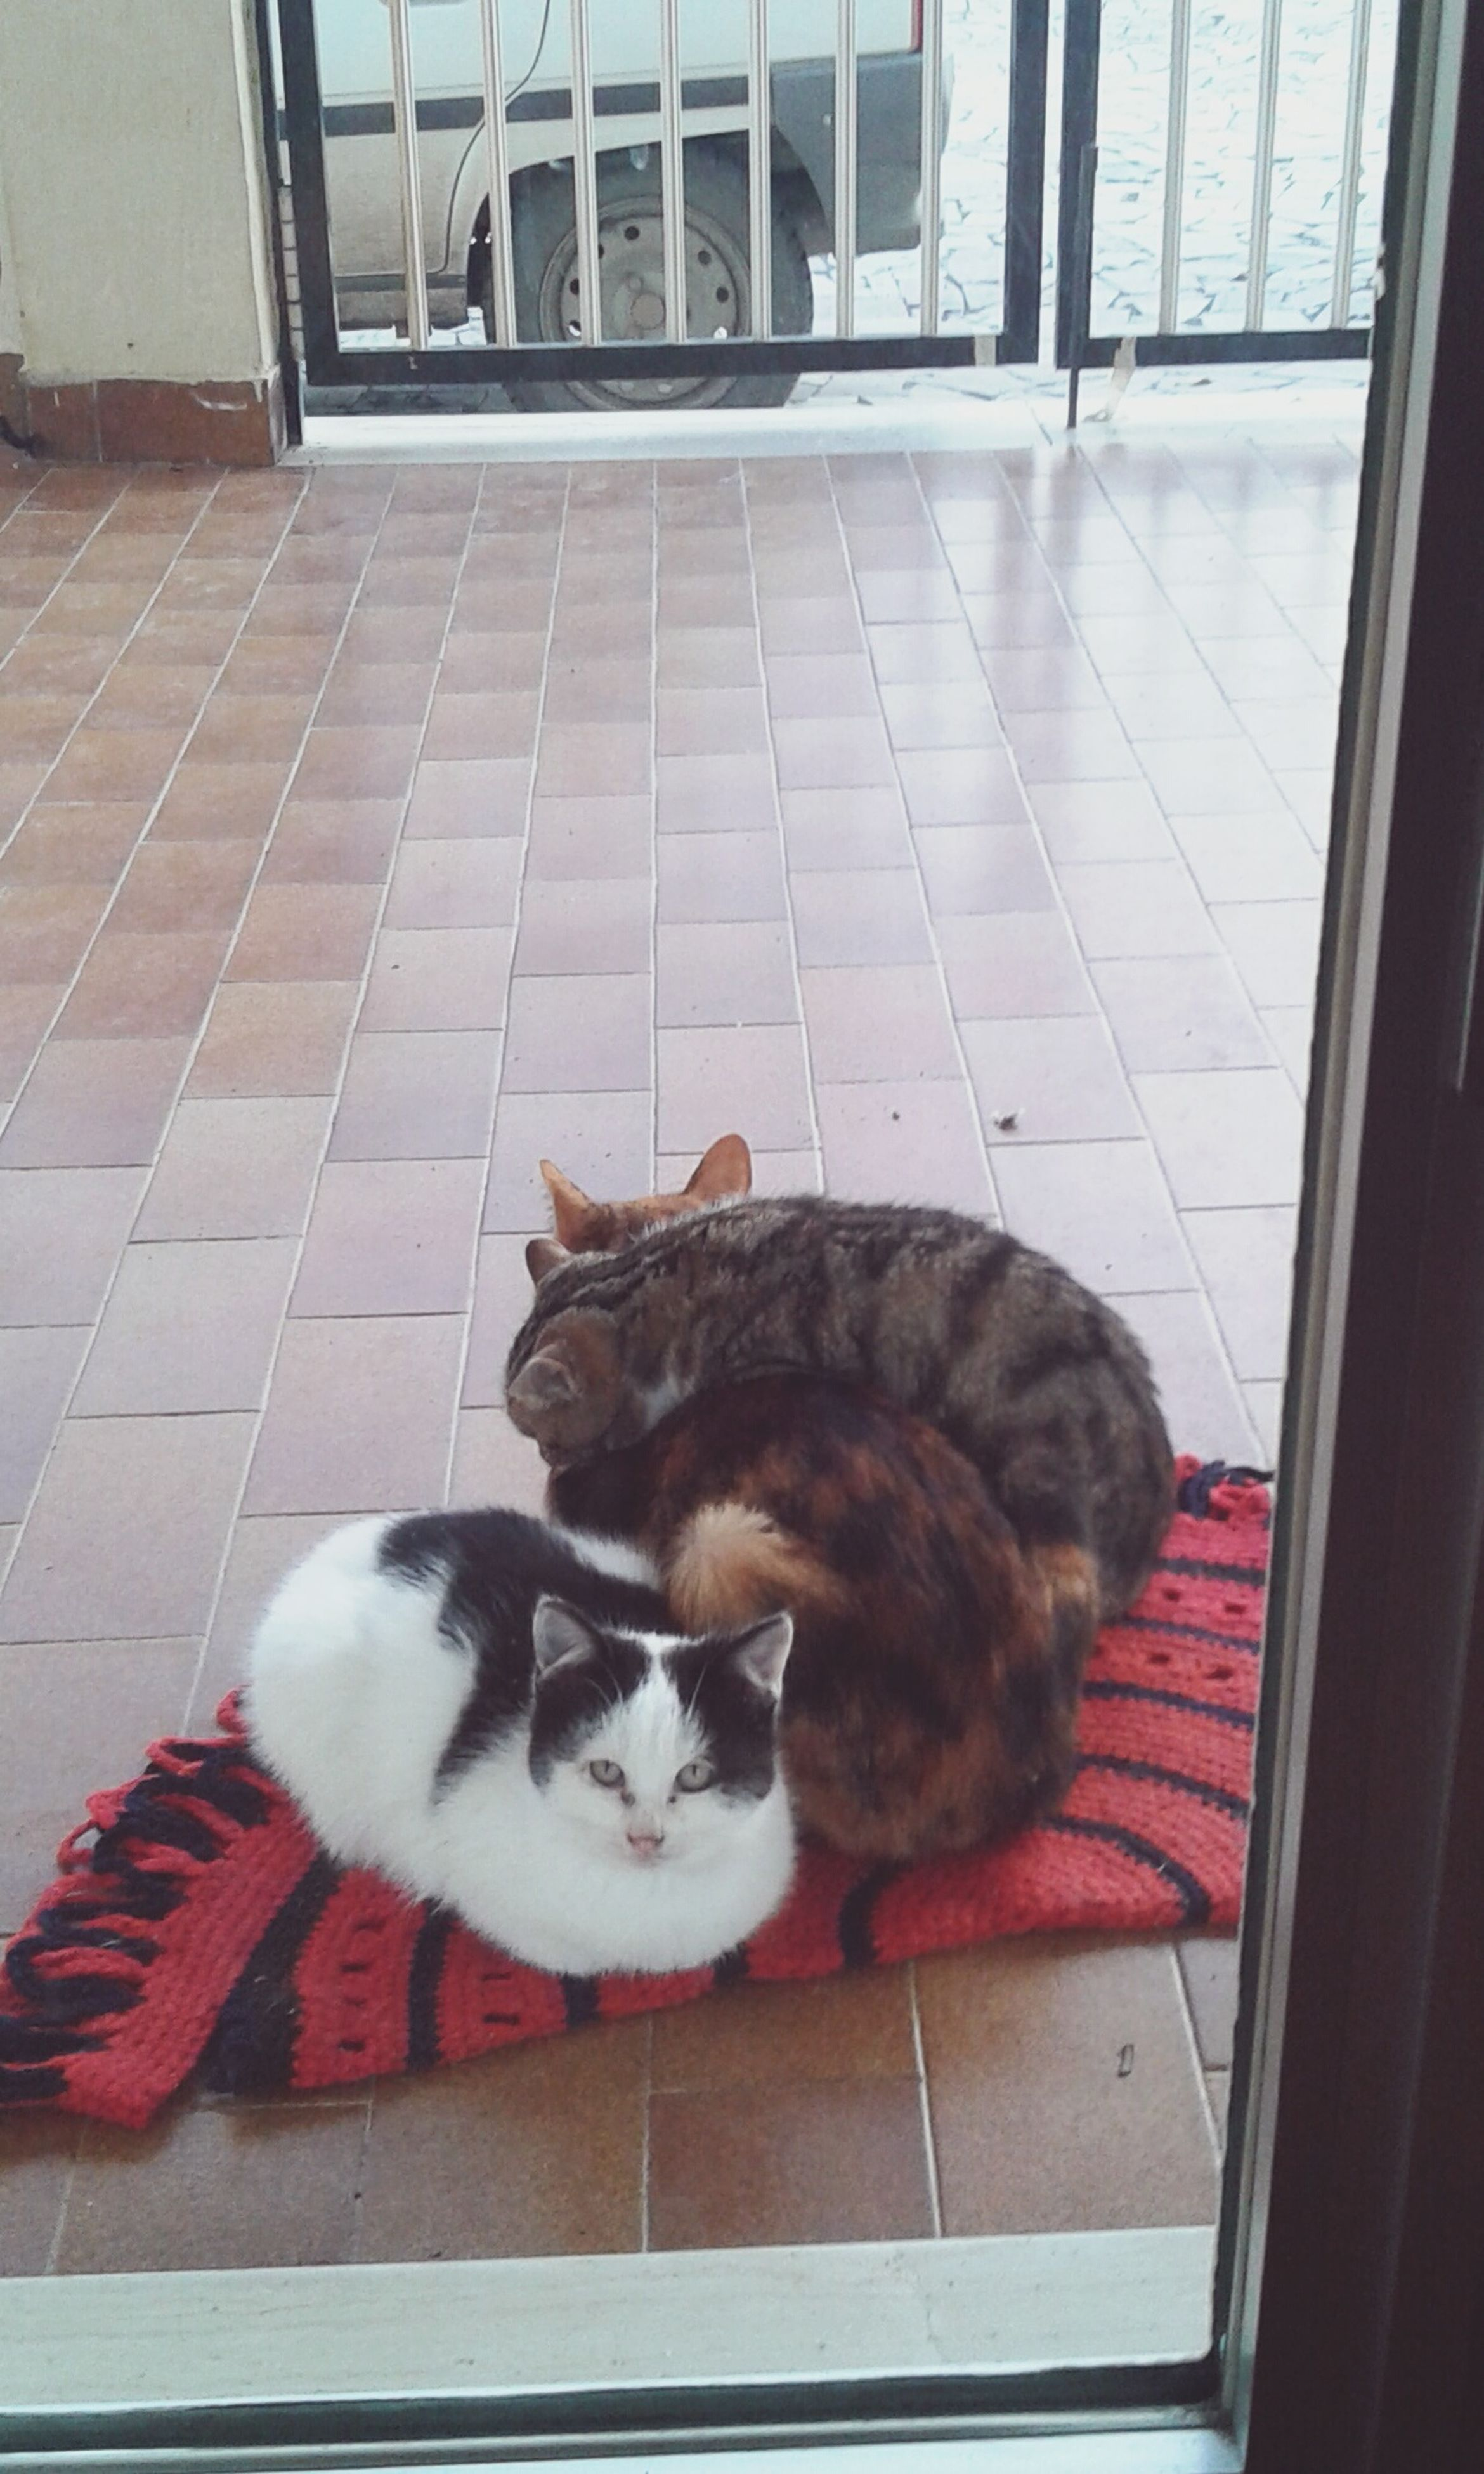 pets, domestic cat, domestic animals, mammal, animal themes, feline, one animal, indoors, no people, portrait, yawning, day